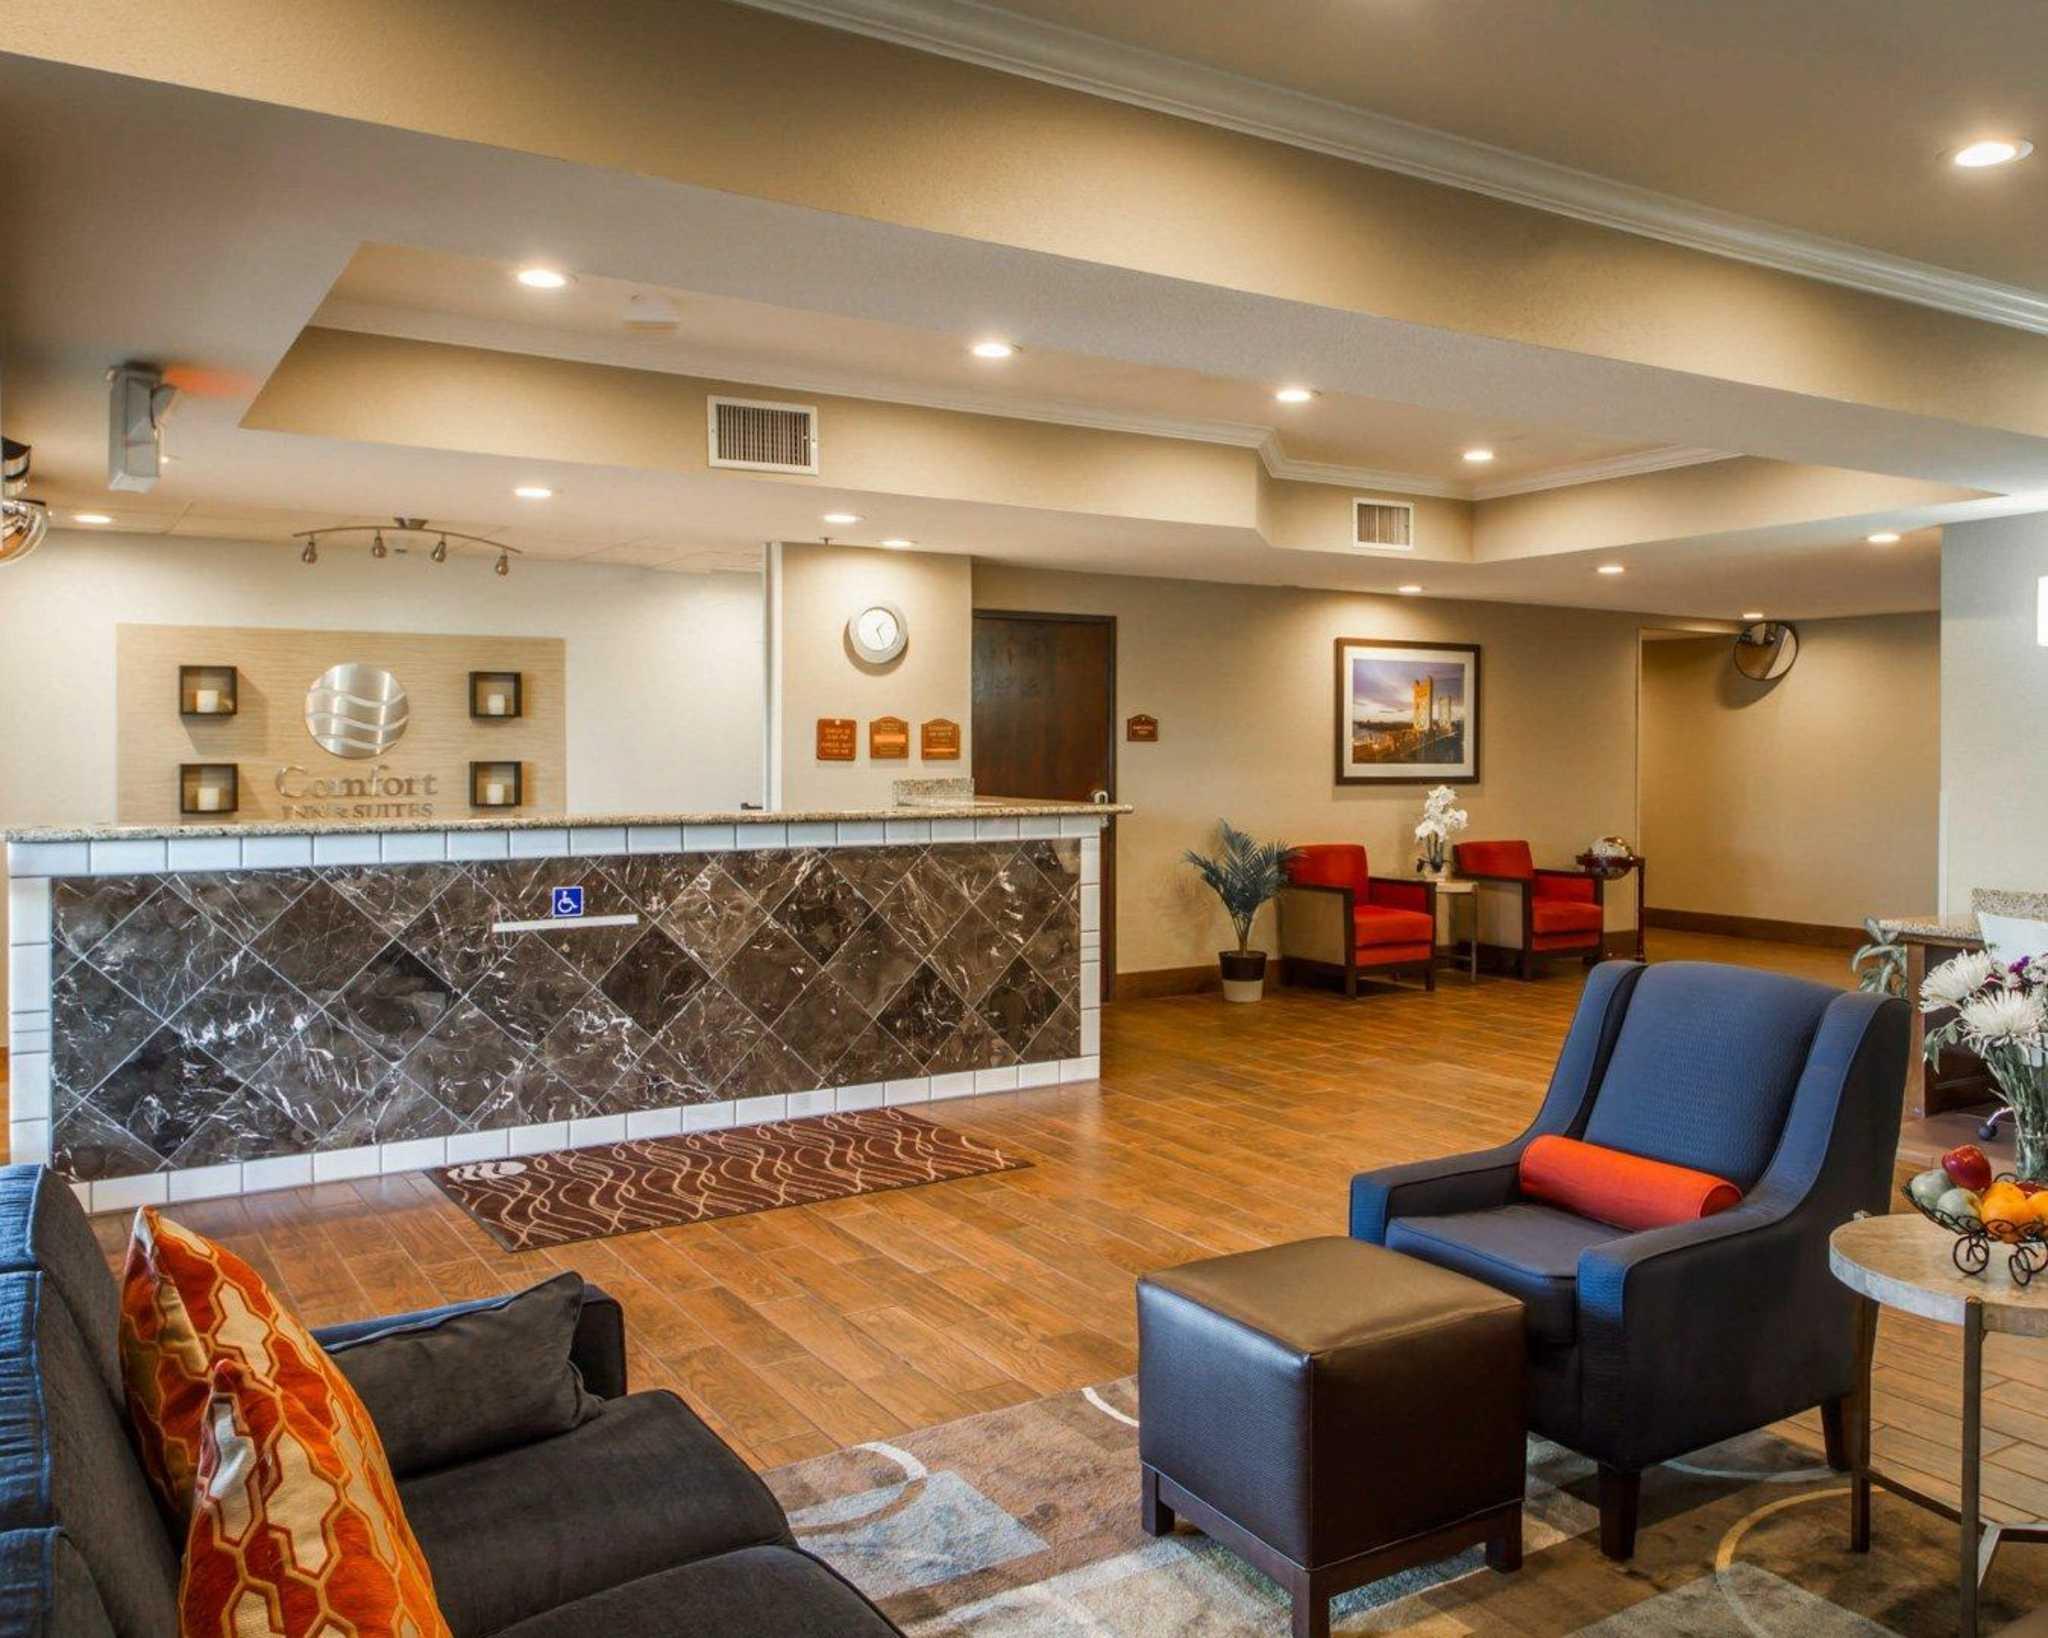 Comfort Inn & Suites Sacramento - University Area image 7